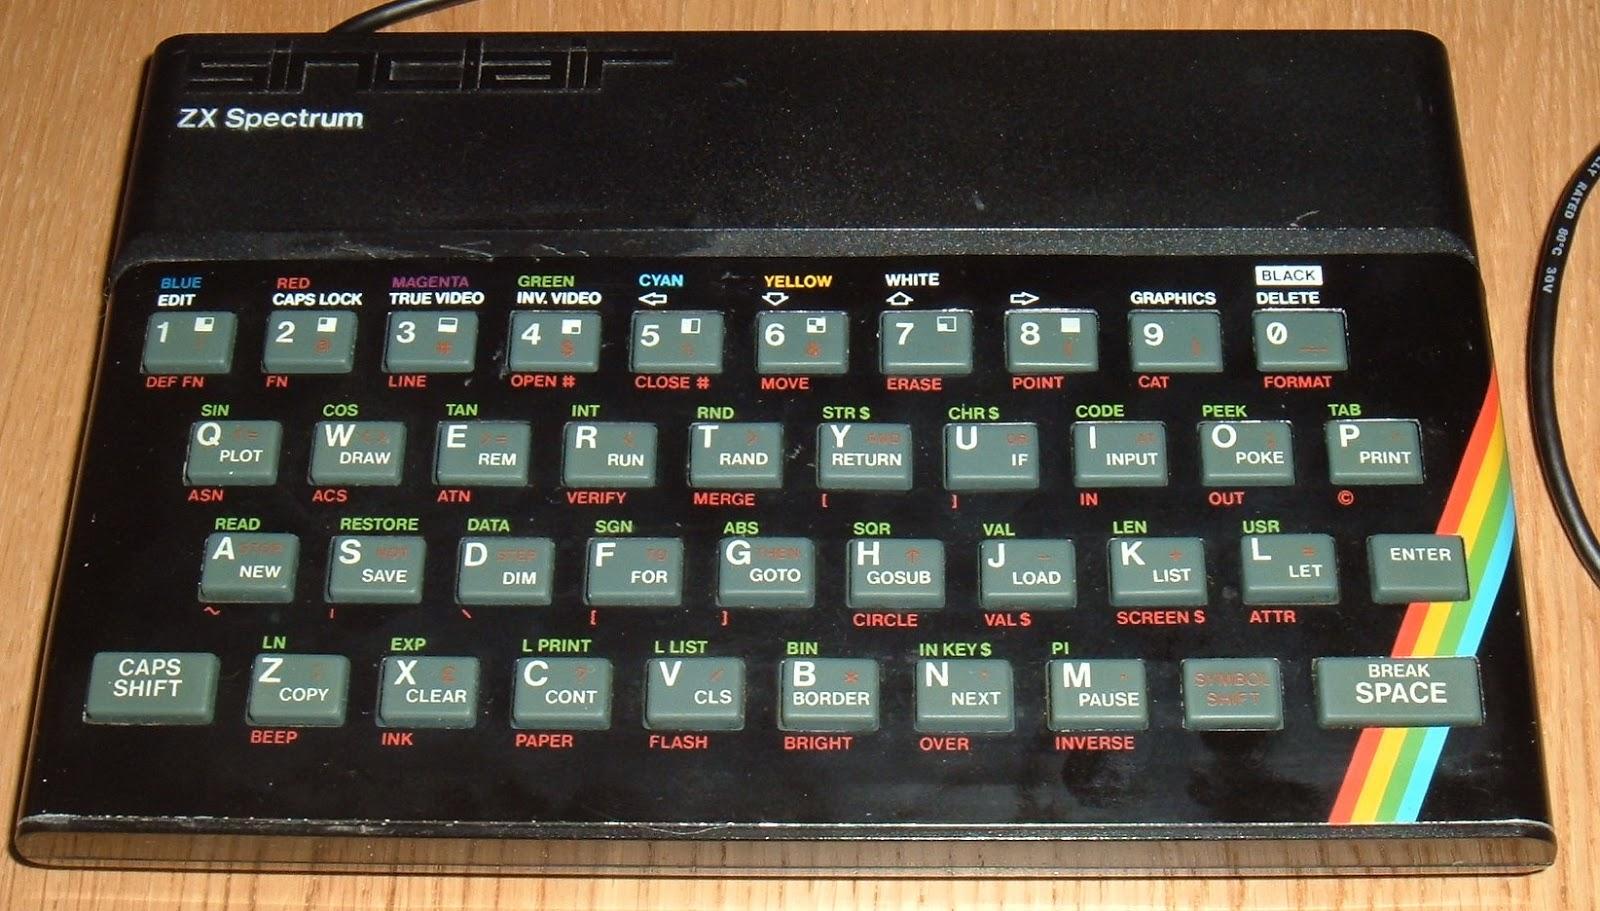 Raspberry Pi gets a ZX Spectrum emulator Pimulators t